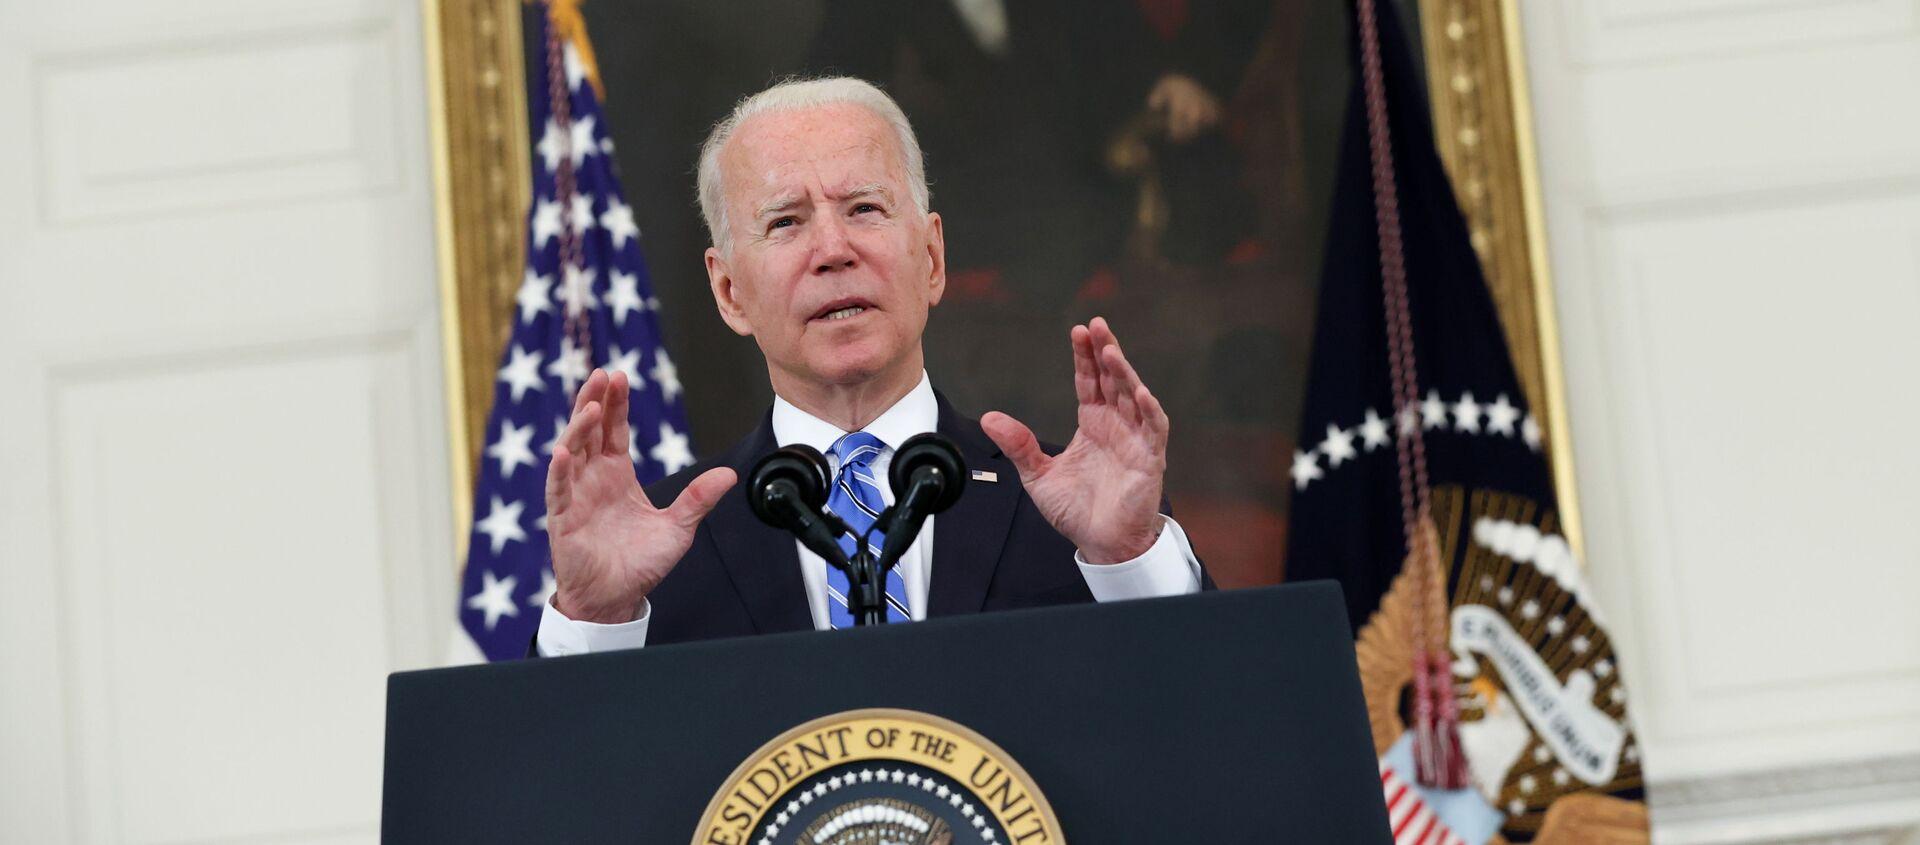 U.S. President Biden delivers remarks on the economy at the White House in Washington - Sputnik International, 1920, 19.07.2021